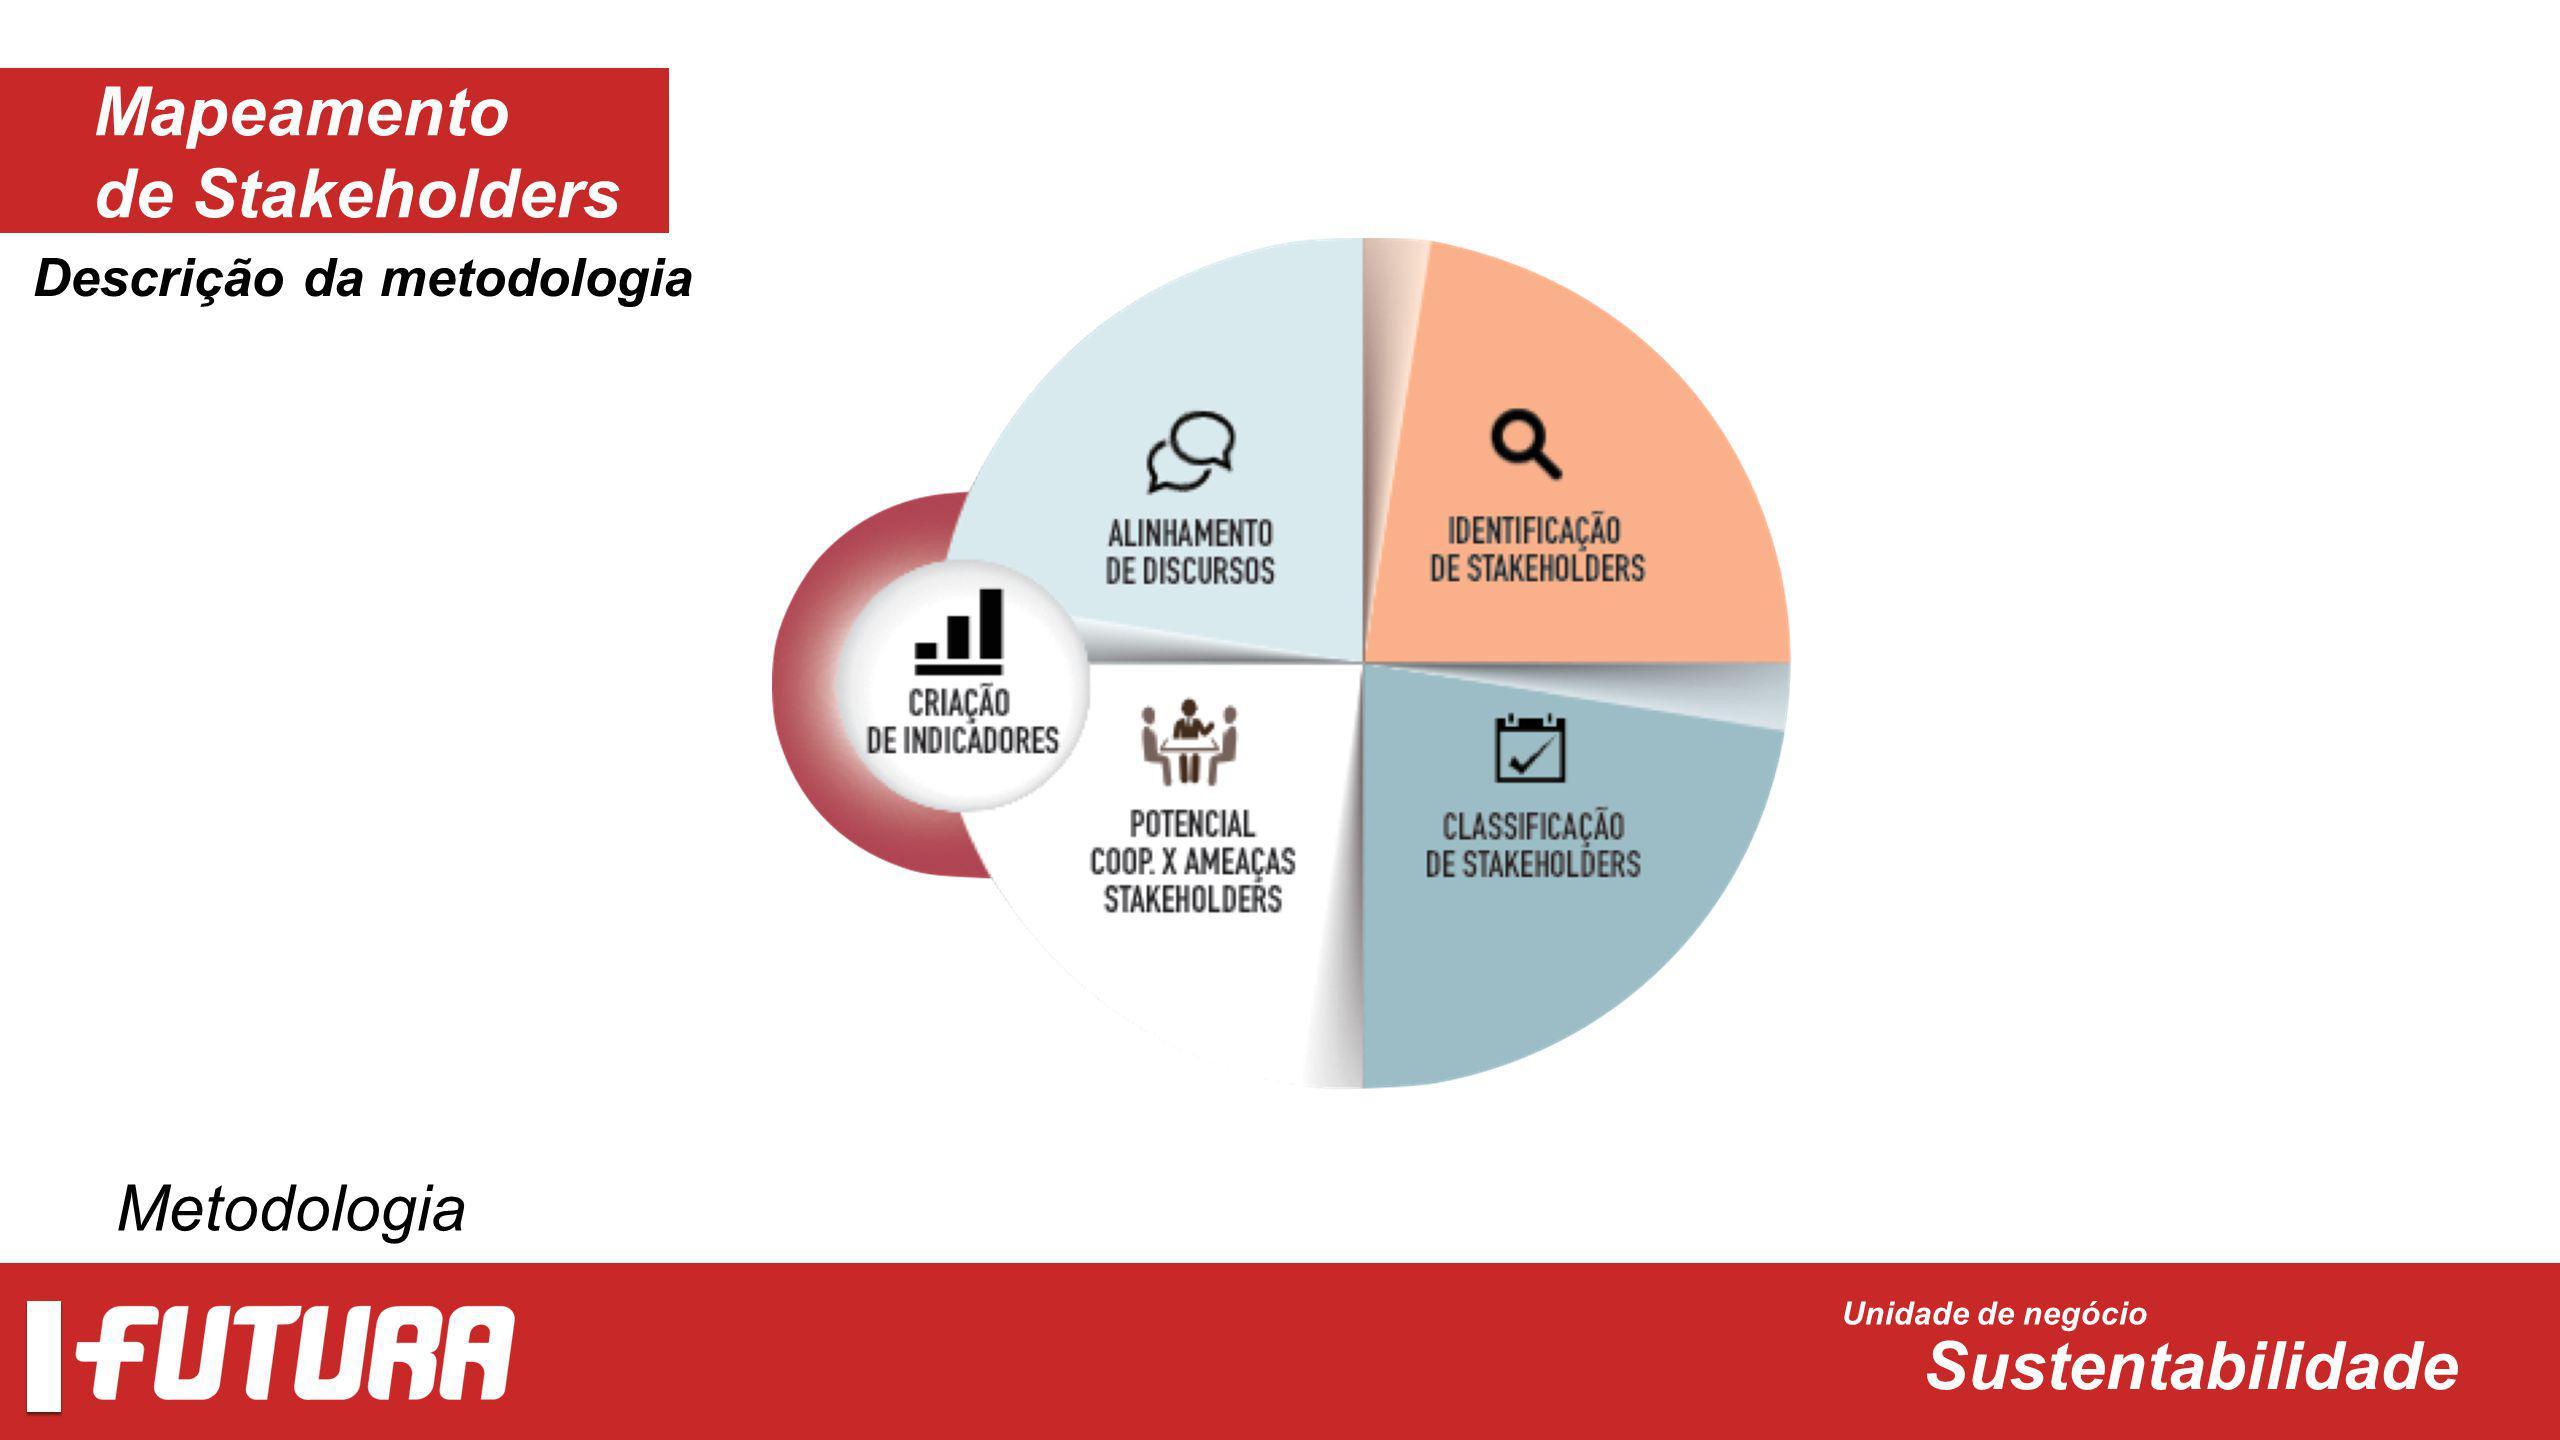 Mapeamento de Stakeholders Unidade de negócio Sustentabilidade Metodologia Unidade de negócio Sustentabilidade Descrição da metodologia